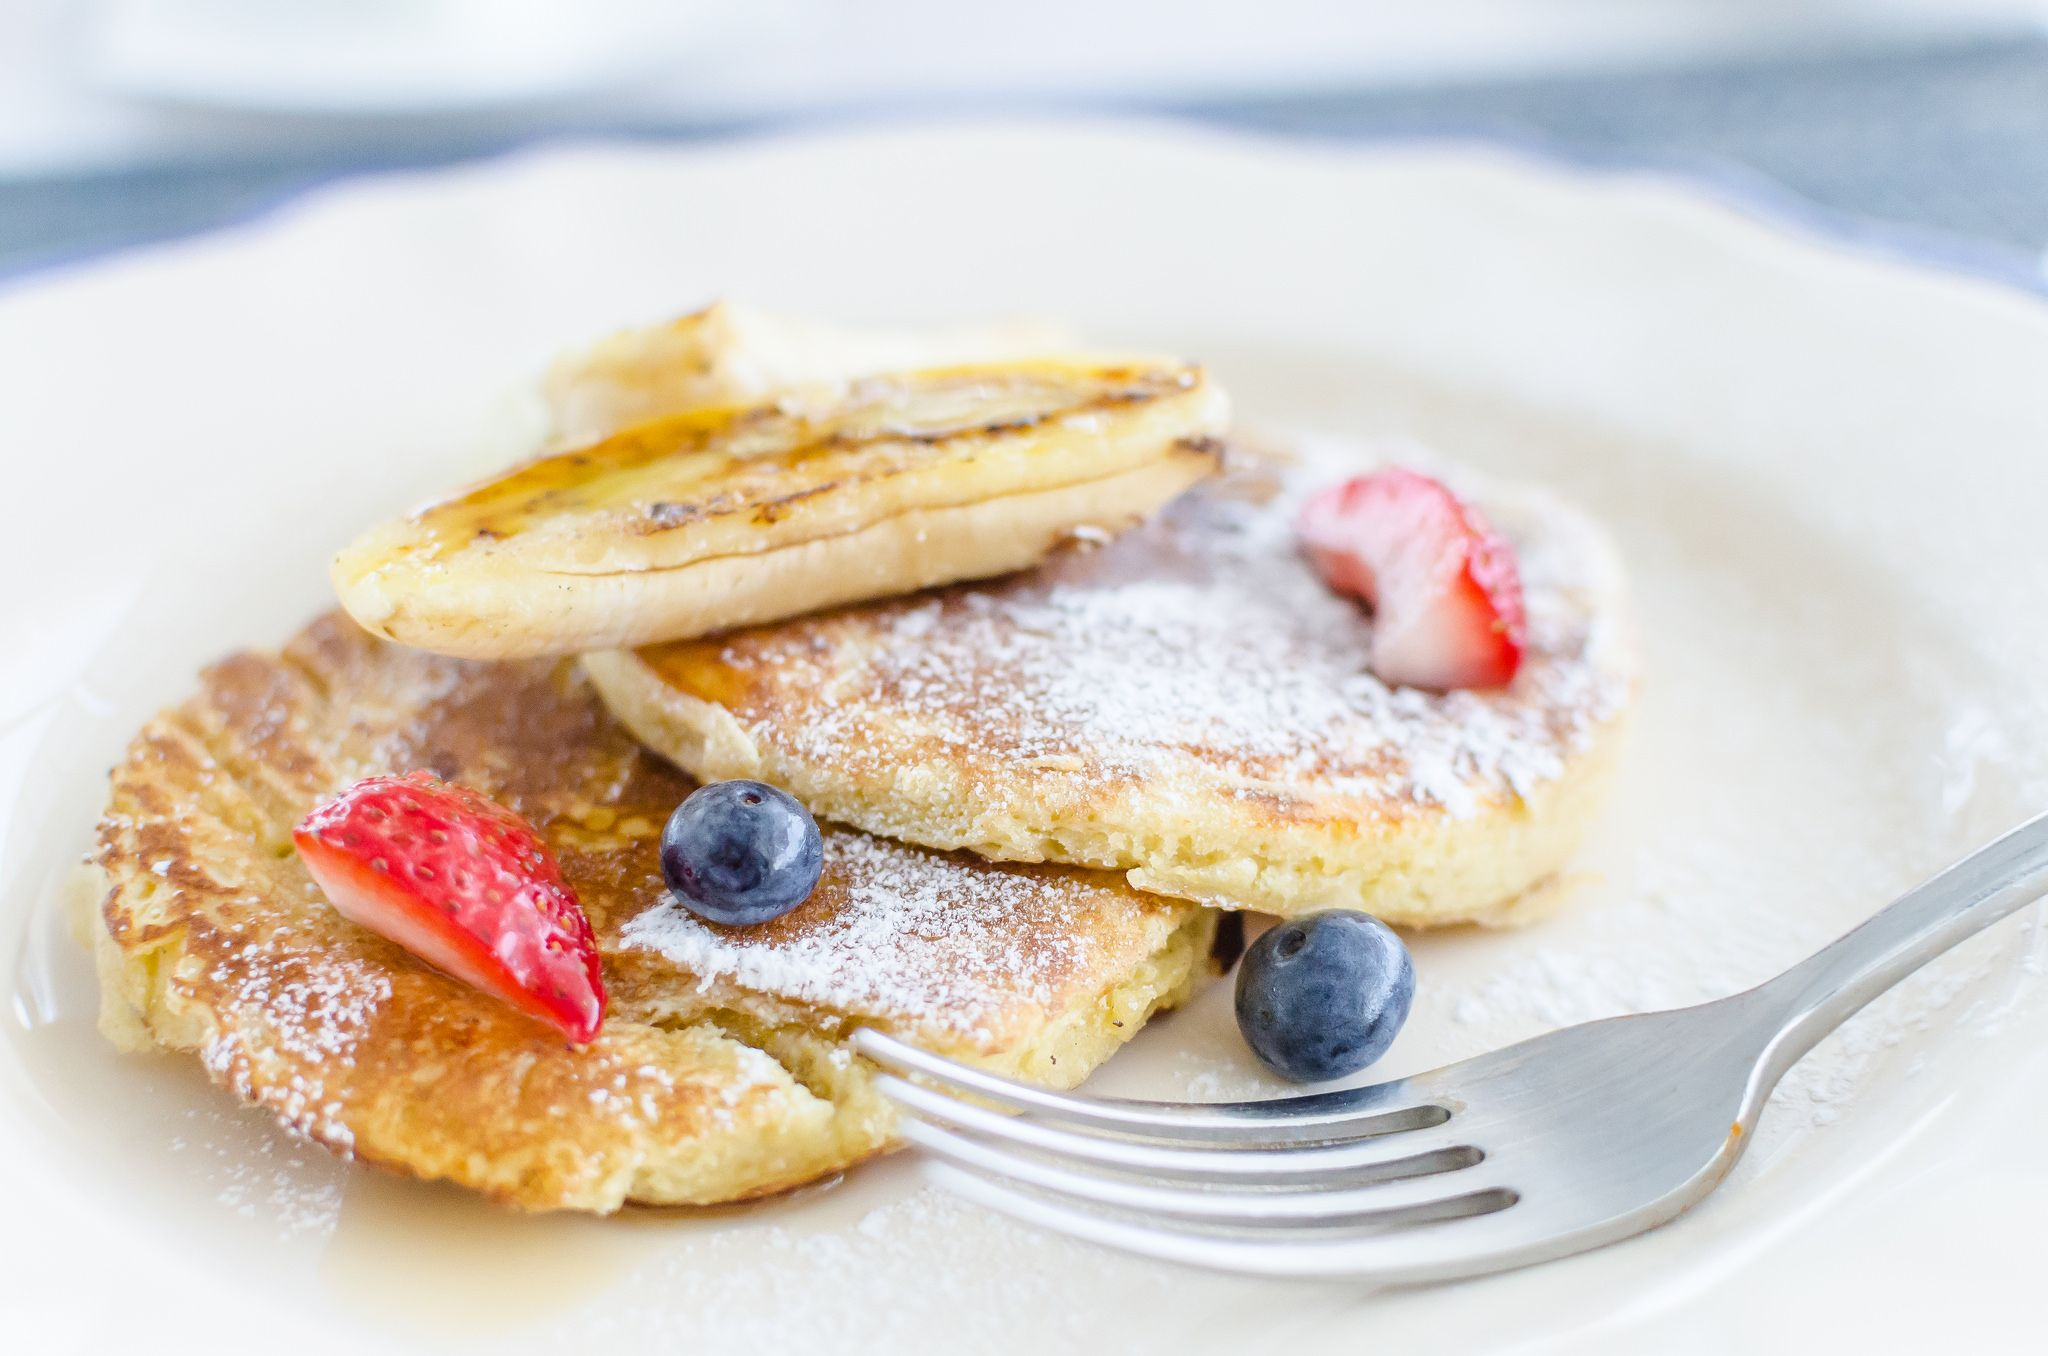 https://flic.kr/p/vFaHfo | pankcakes